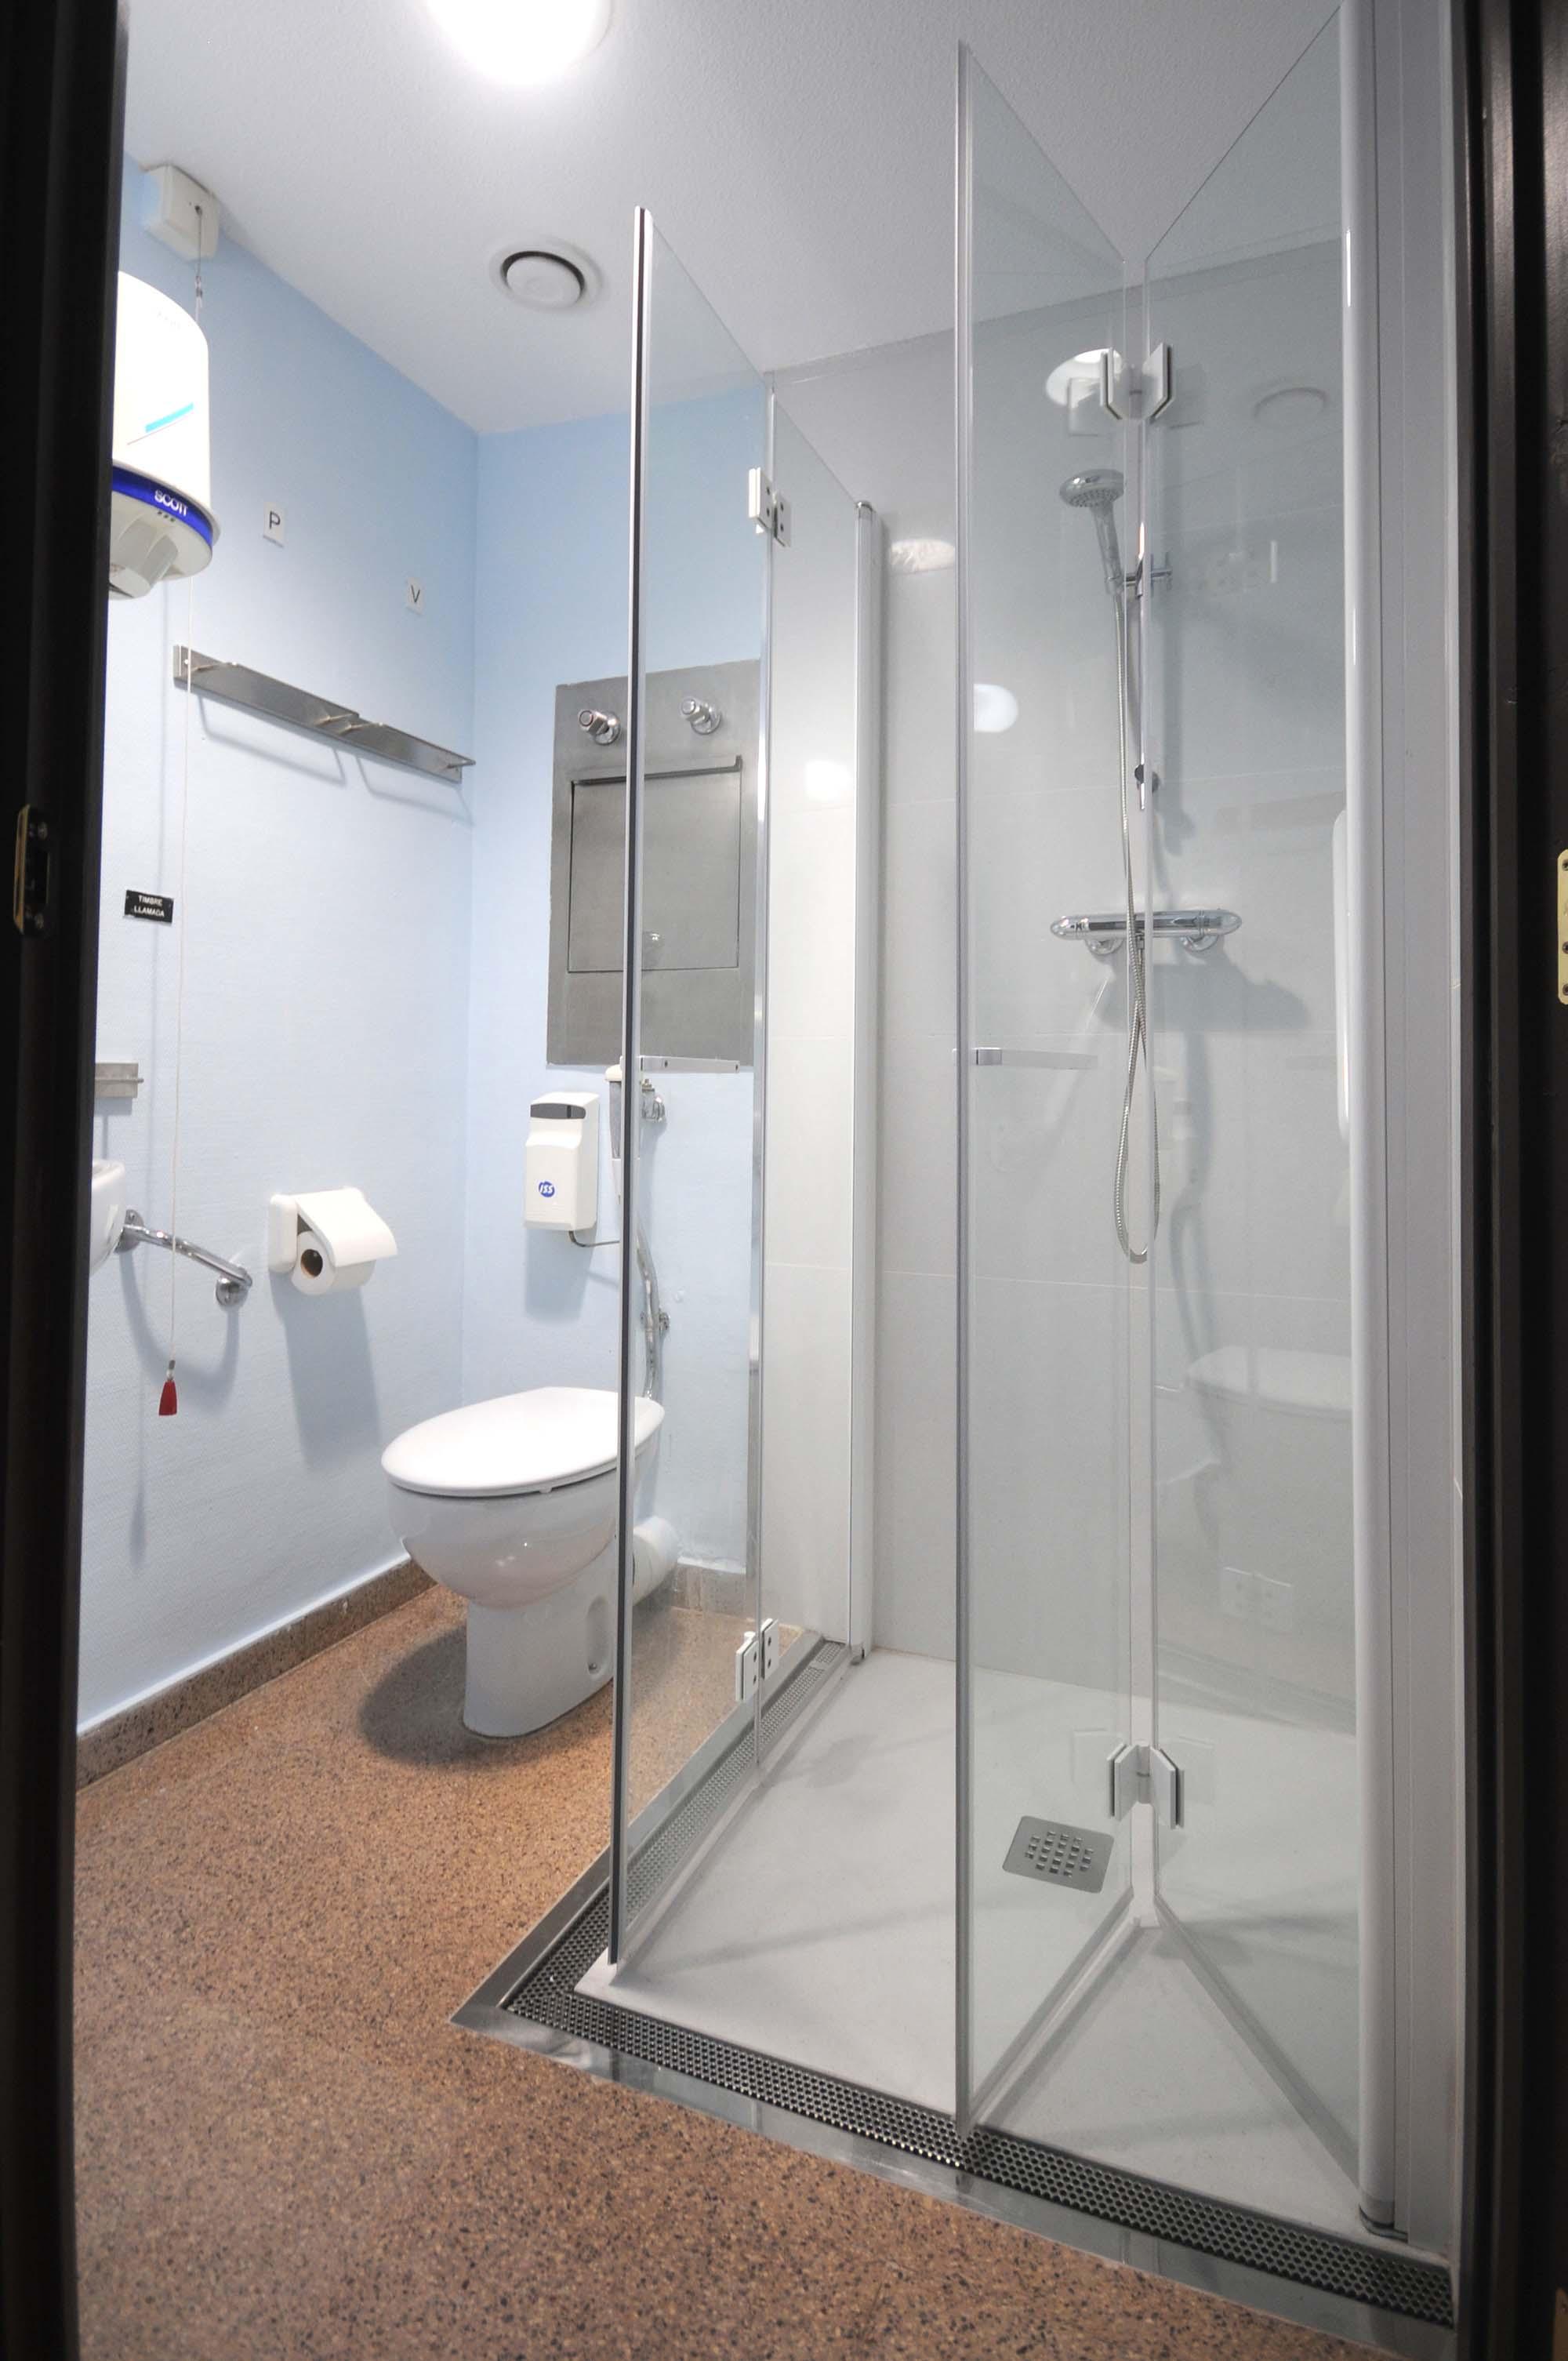 convertir ducha en baera latest finest excellent fabulous On convertir banera en ducha sin obras